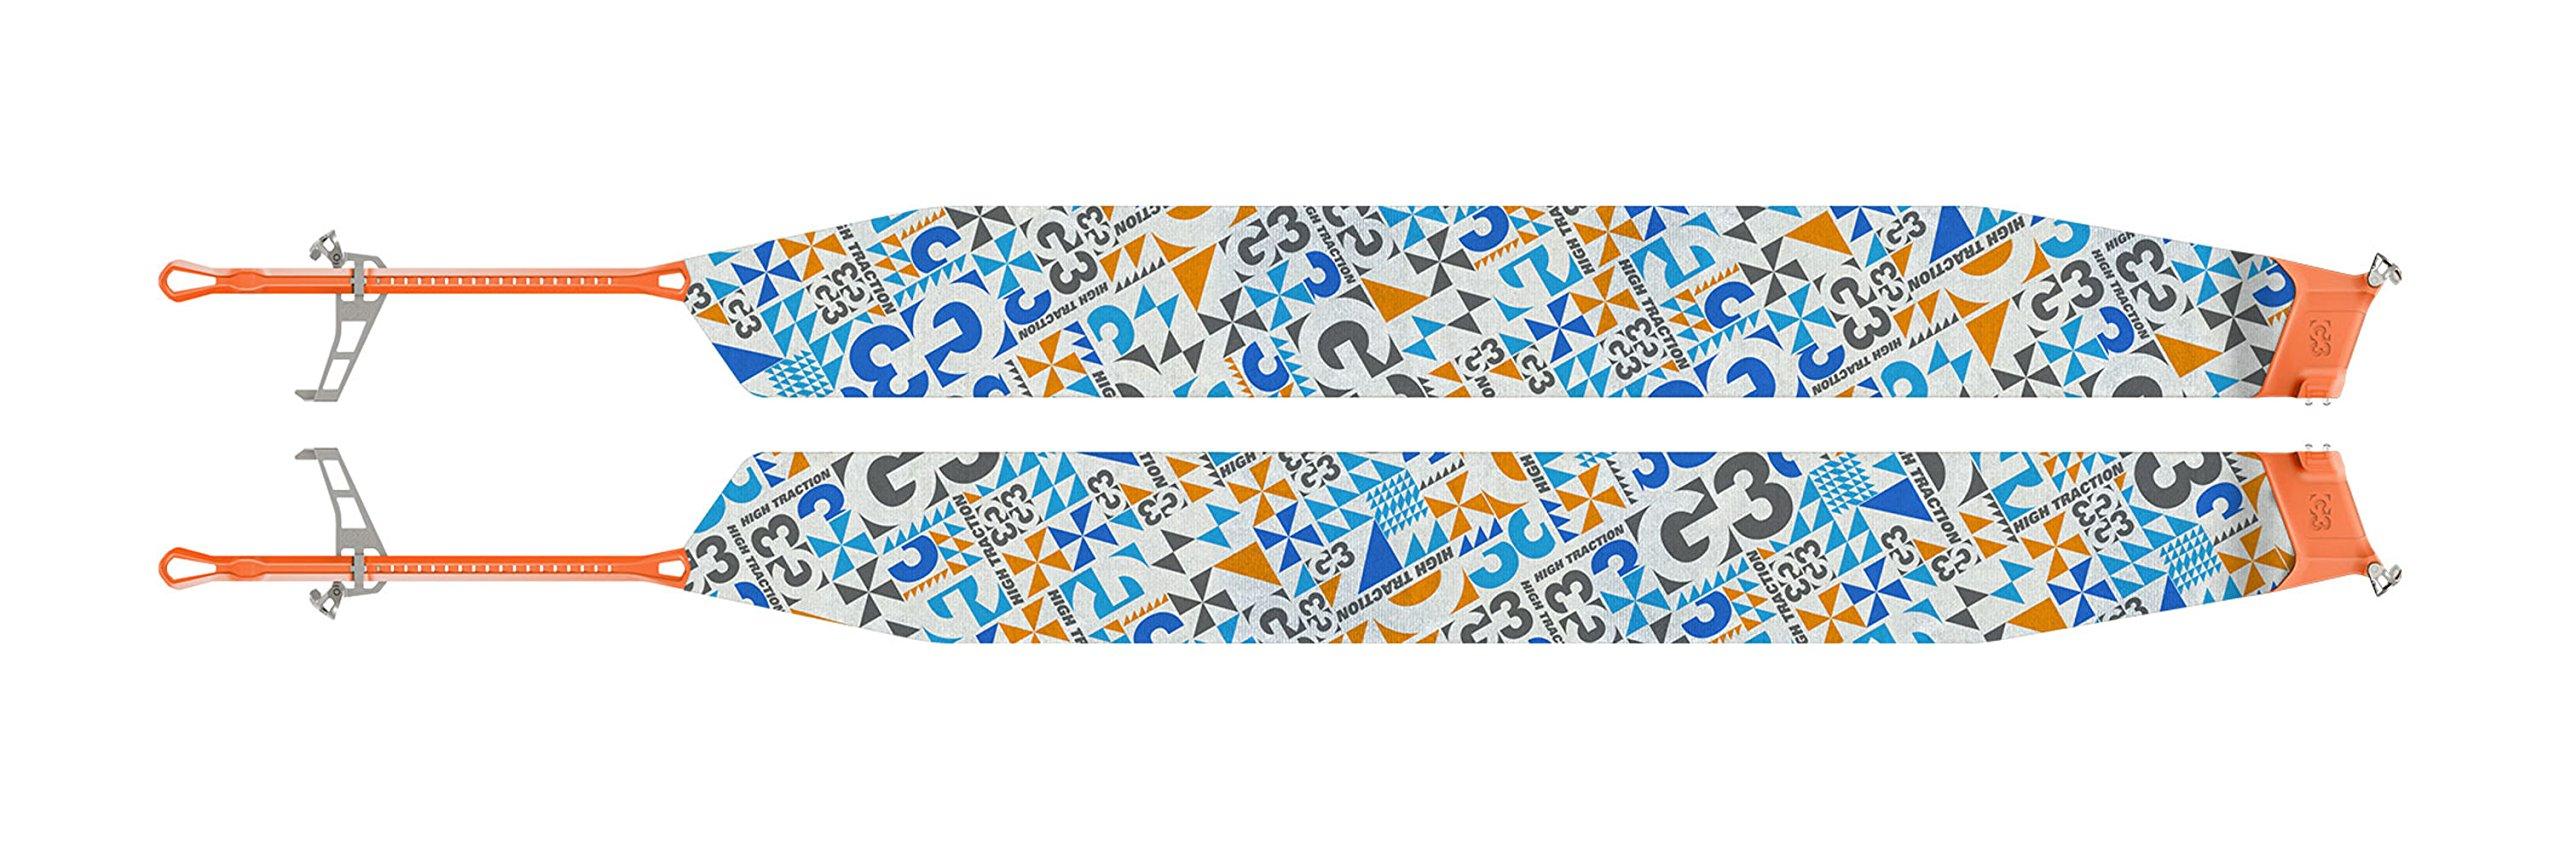 G3 Alpinist Splitboard High Traction Skins - S/M - Blue/Grey/Orange